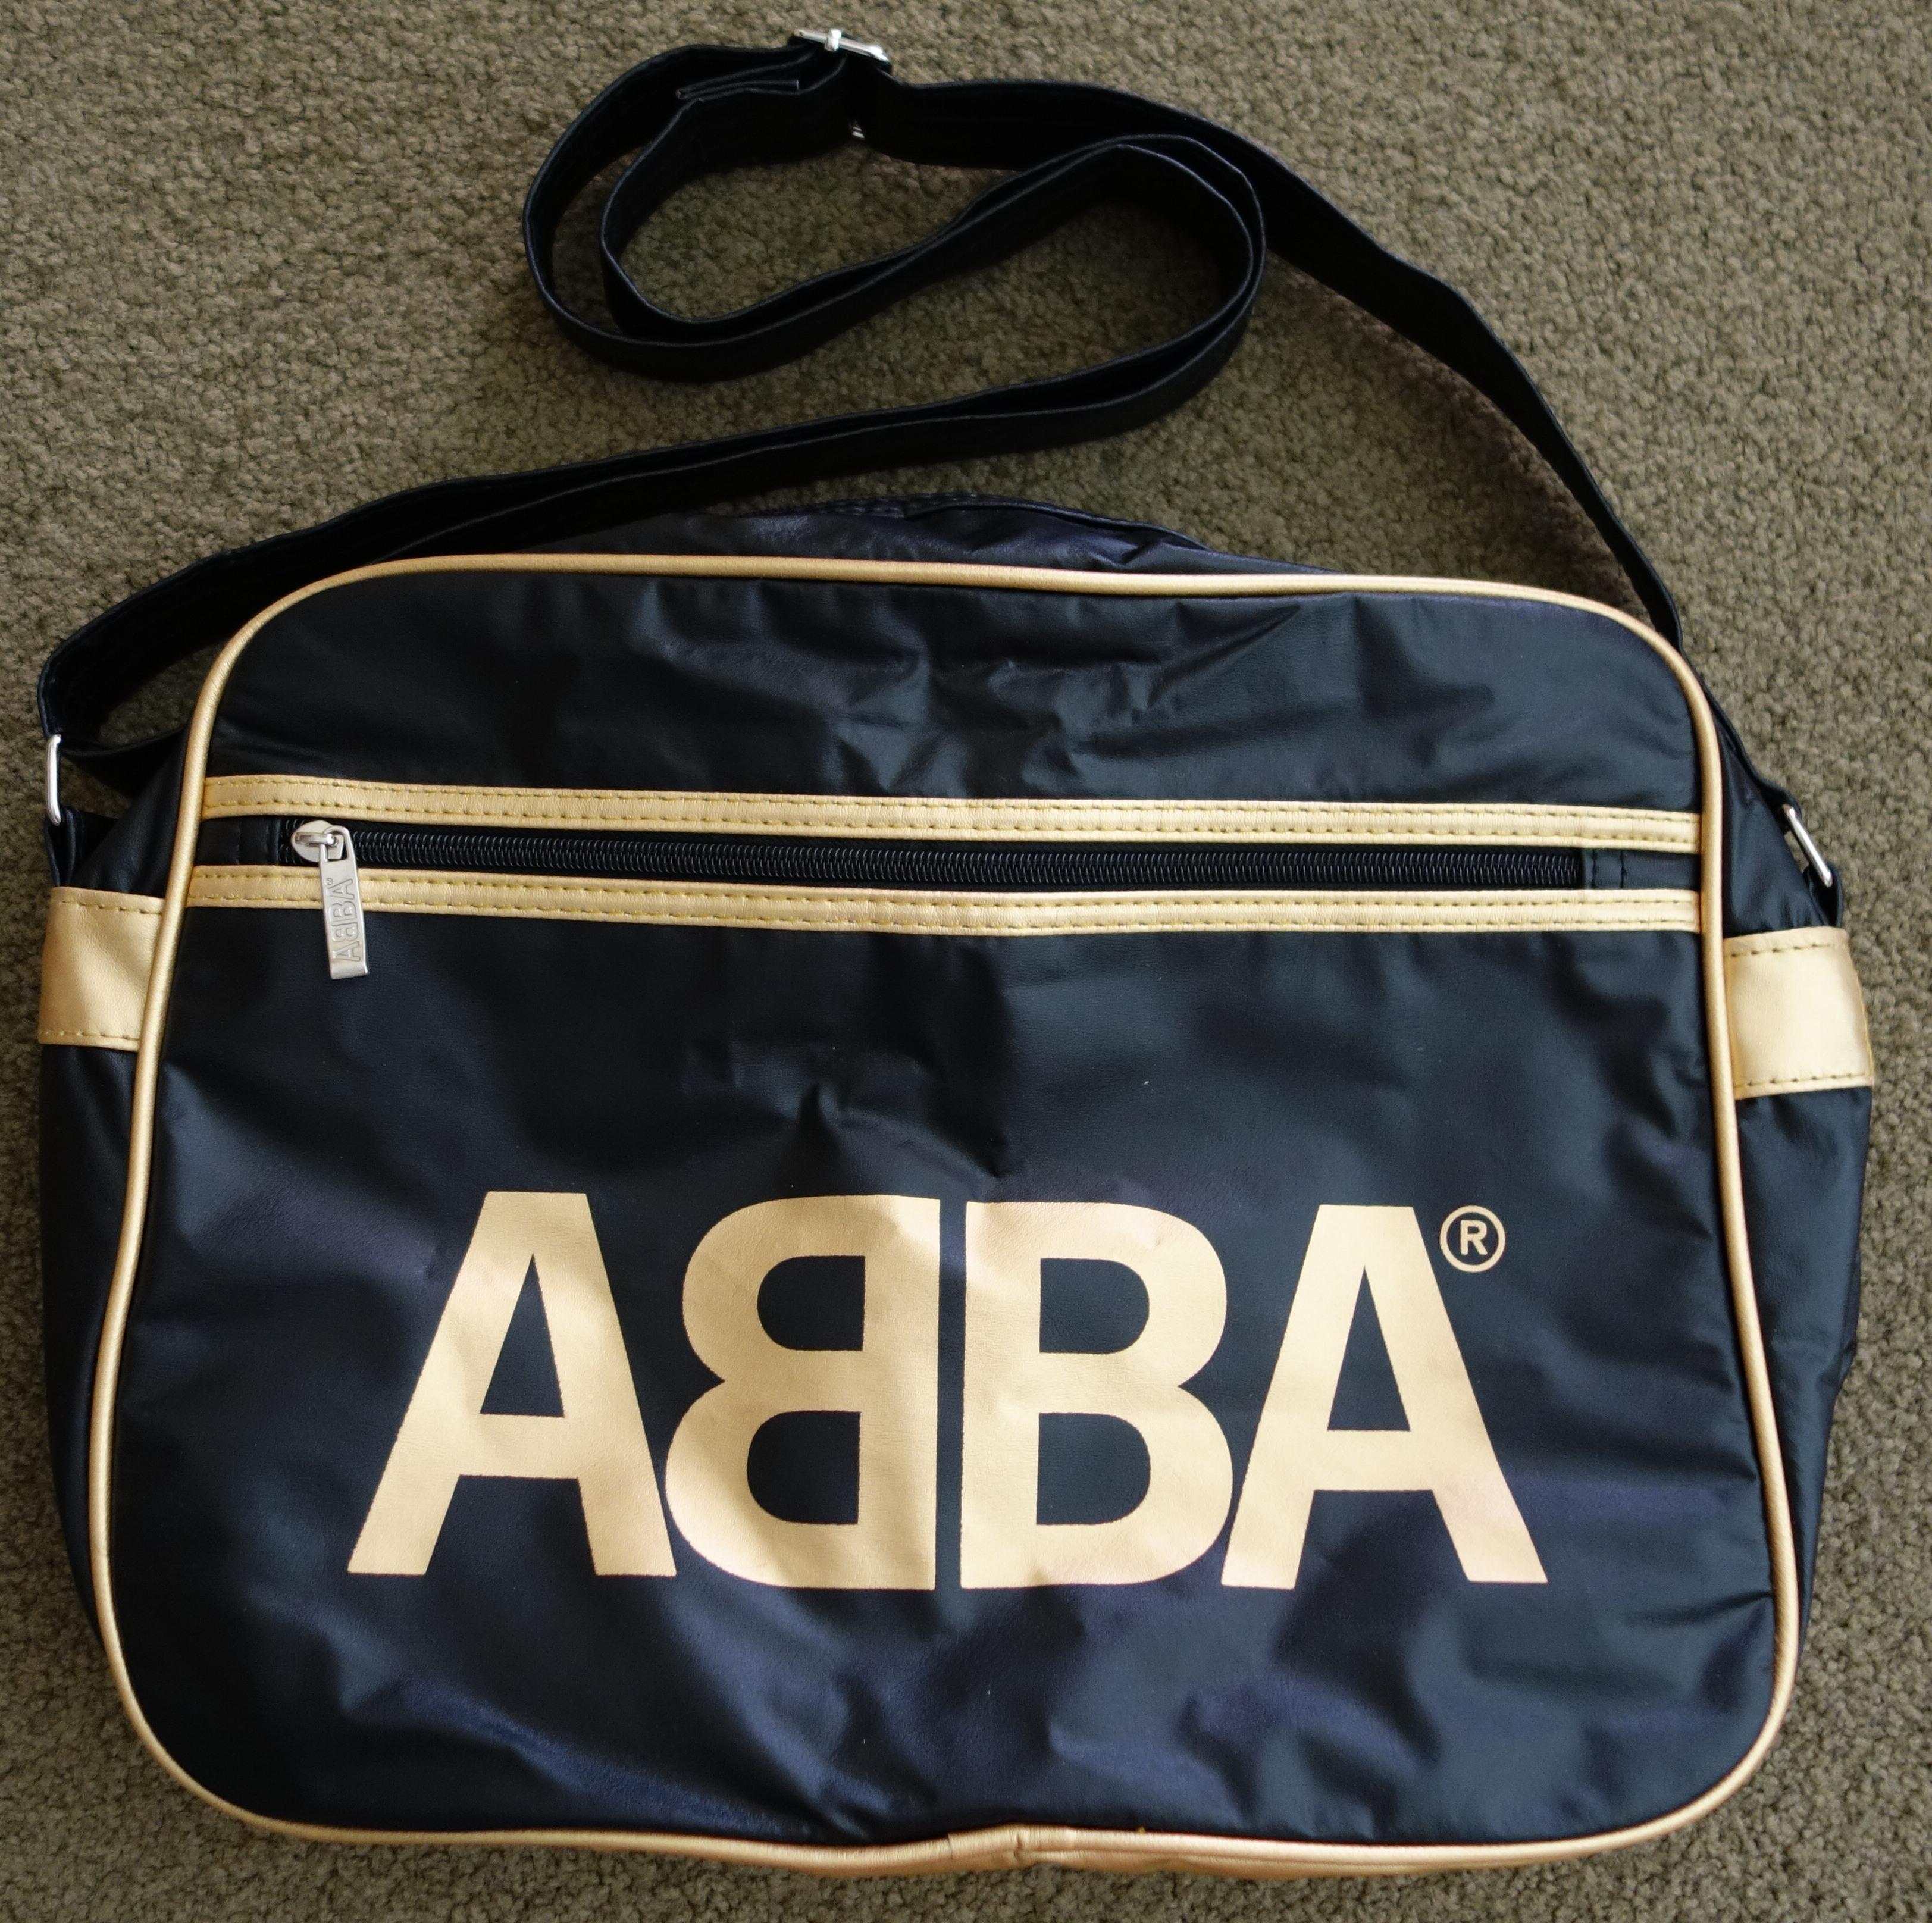 retro bag - black and gold.jpg